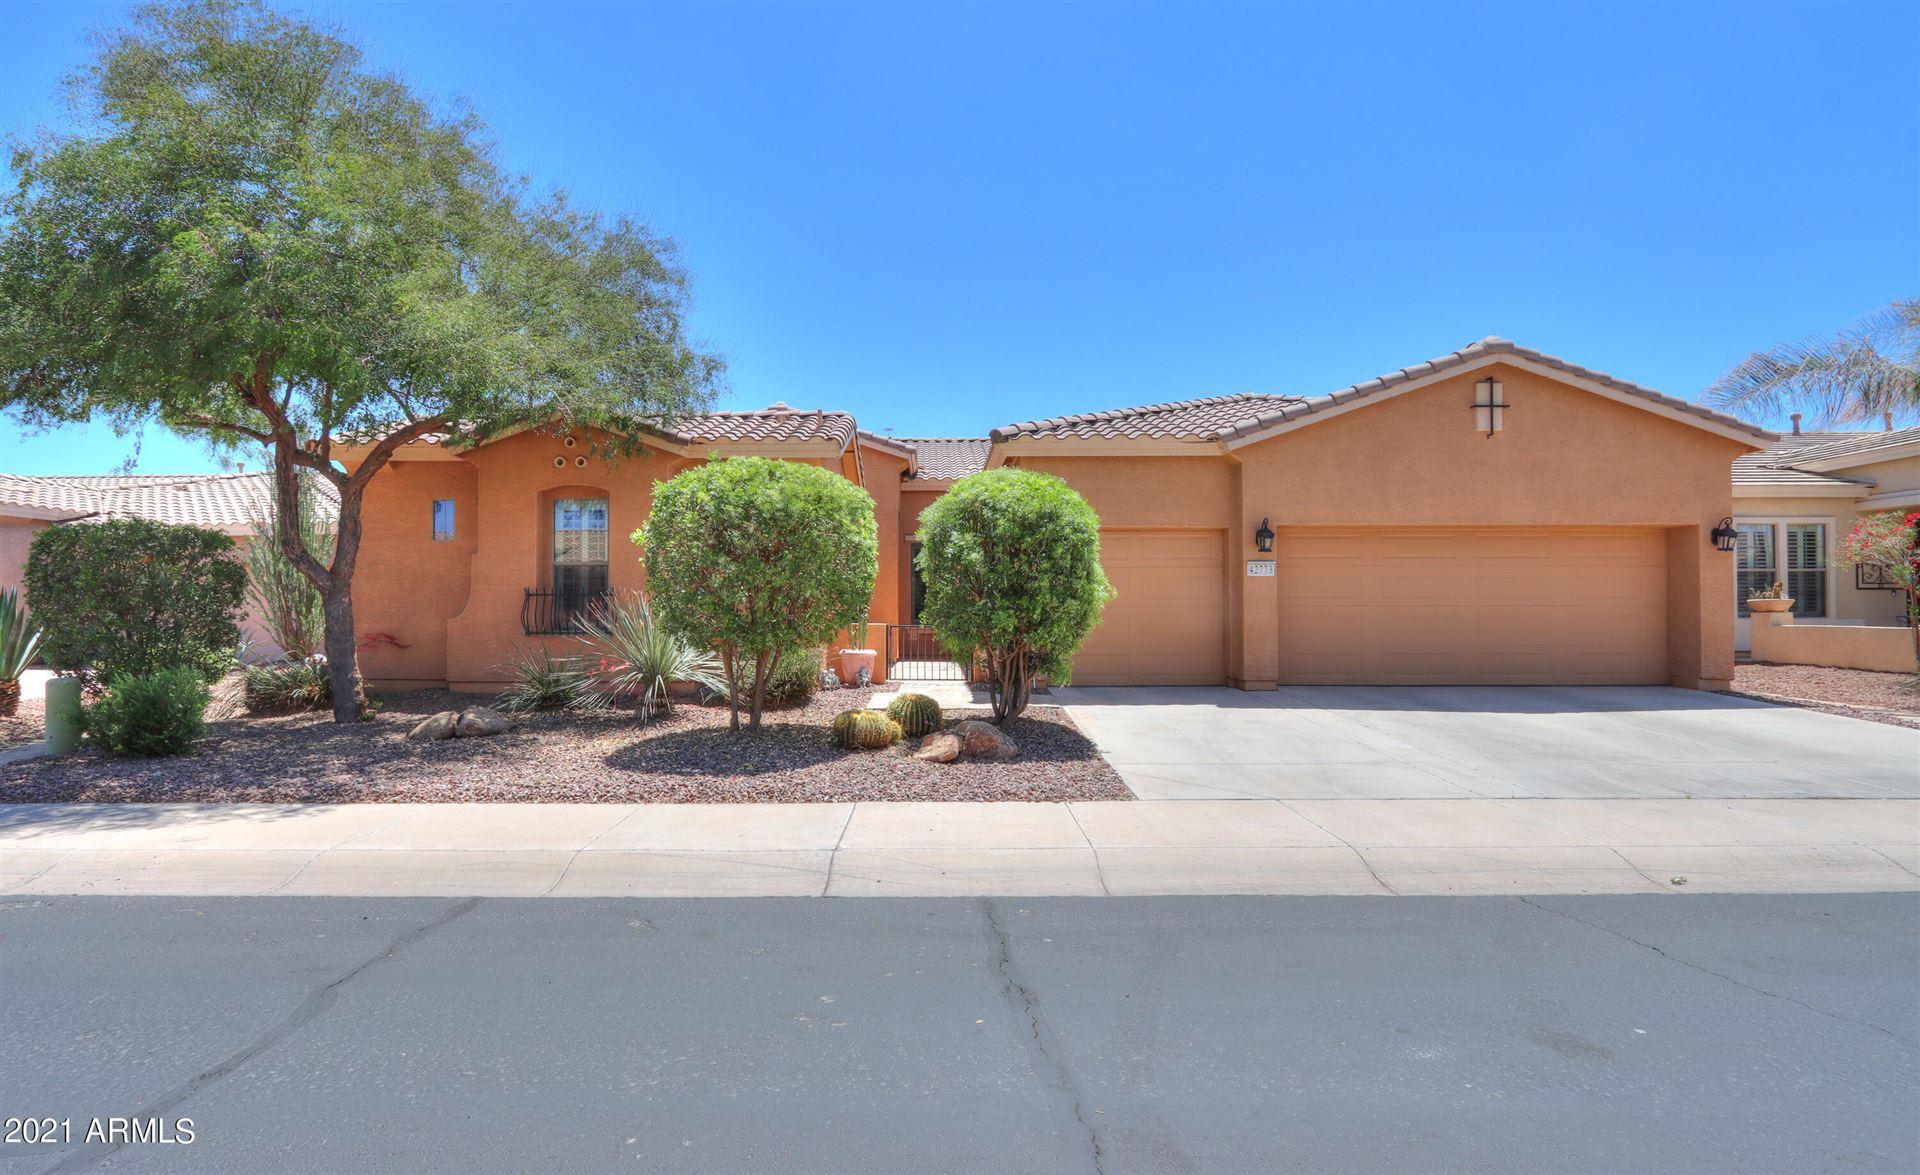 Photo of 42773 W MISTY MORNING Lane, Maricopa, AZ 85138 (MLS # 6231872)